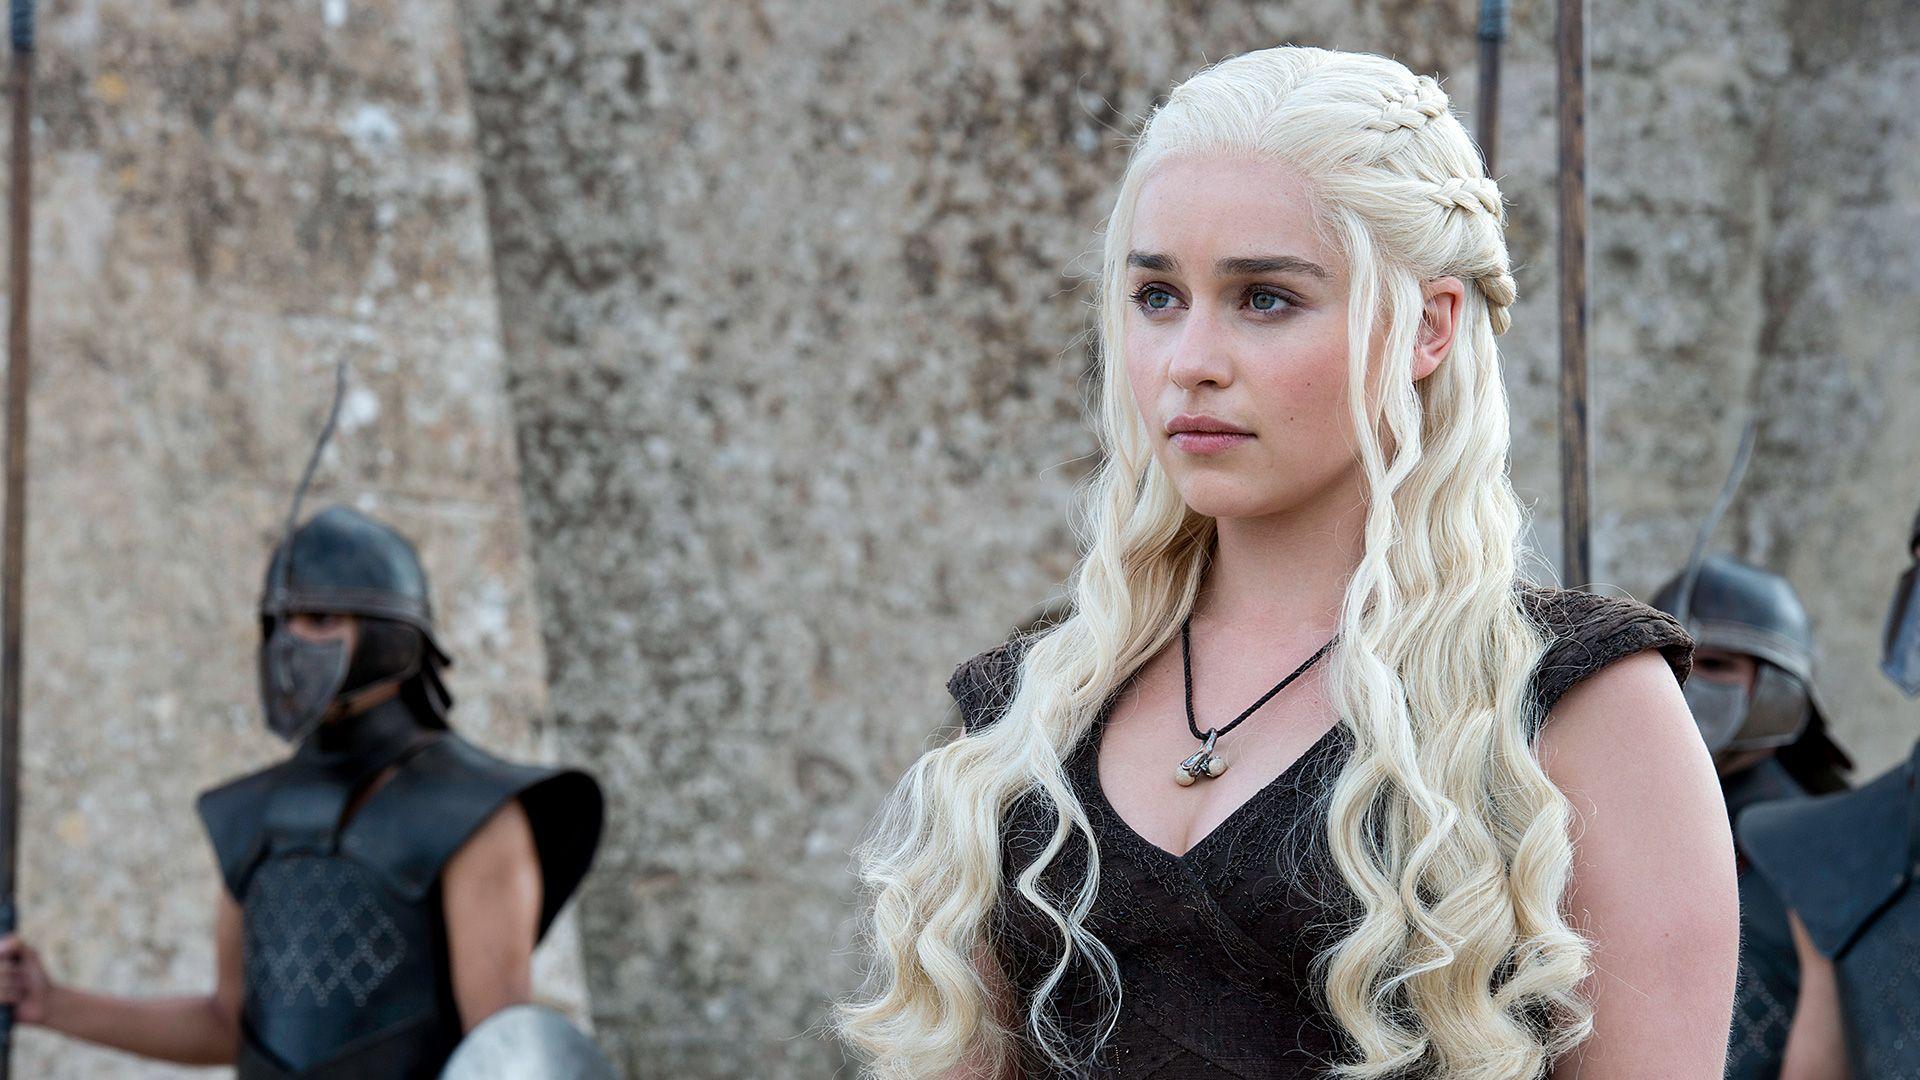 Daenerys targaryen and khal drogo wallpaper daenerys targaryen wedding - Tv Show Game Of Thrones Emilia Clarke Daenerys Targaryen Wallpaper